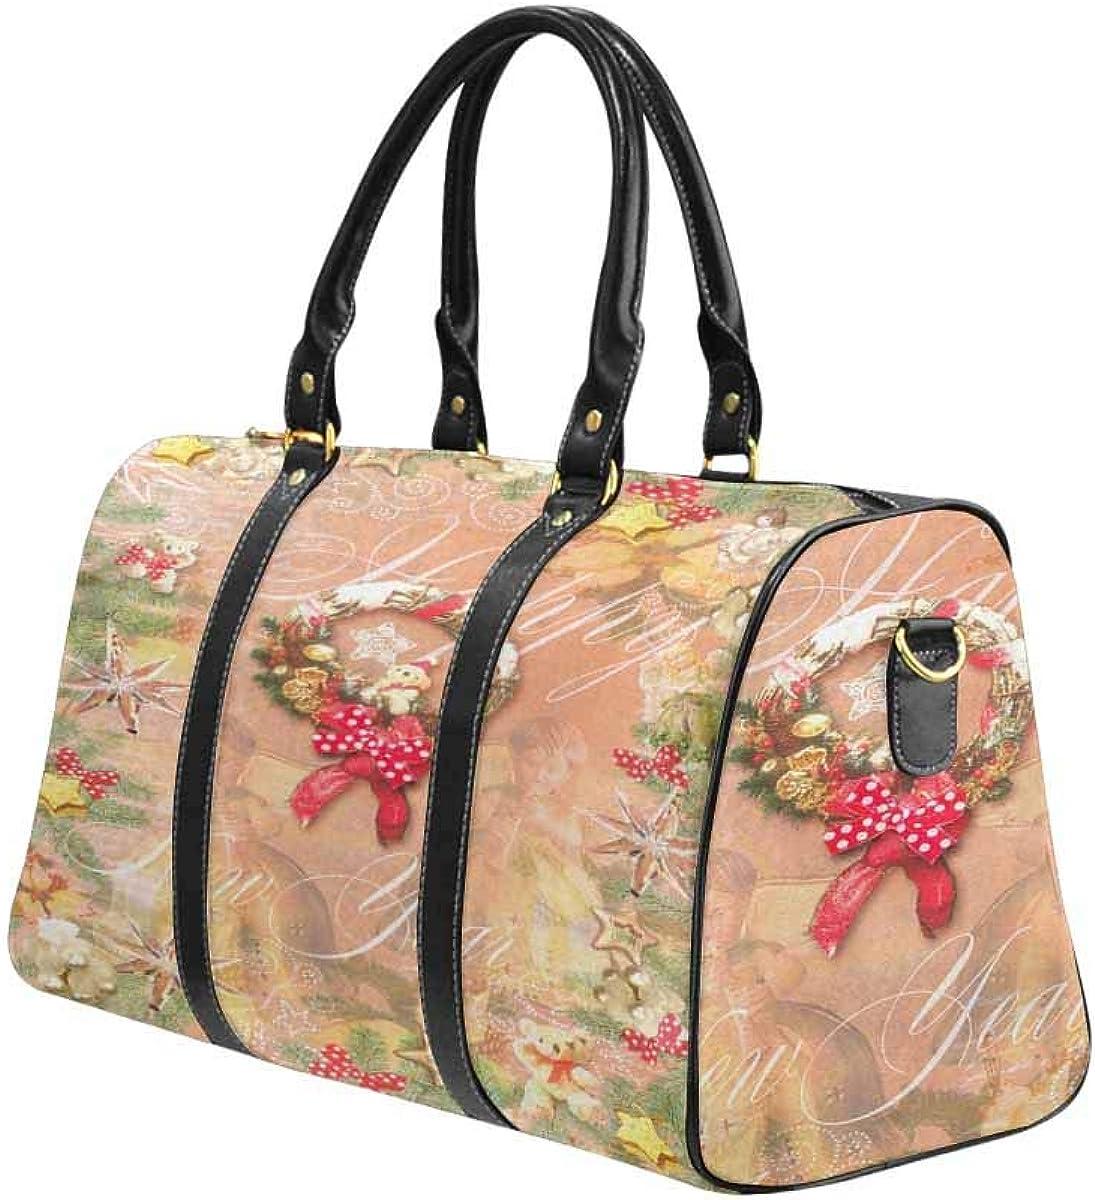 INTERESTPRINT Travel Duffel Bag Waterproof Fabric Overnight Bag